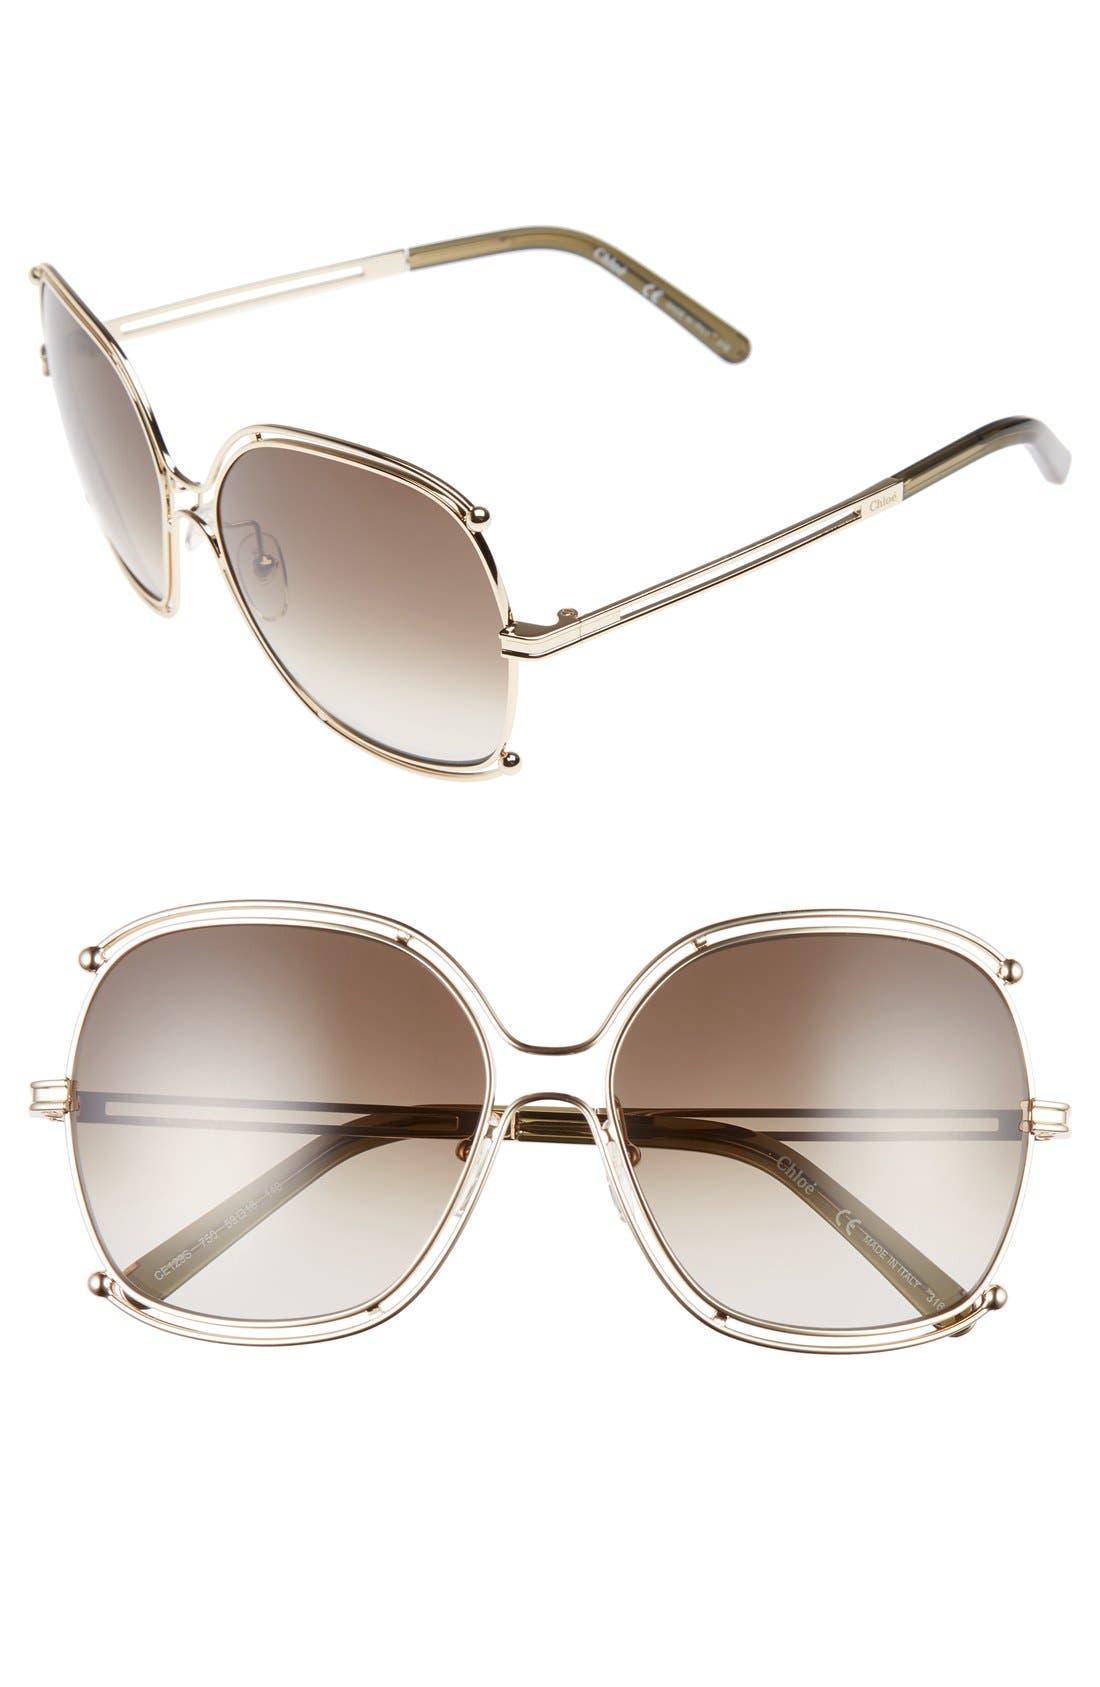 Chloé Isidora 59mm Square Sunglasses